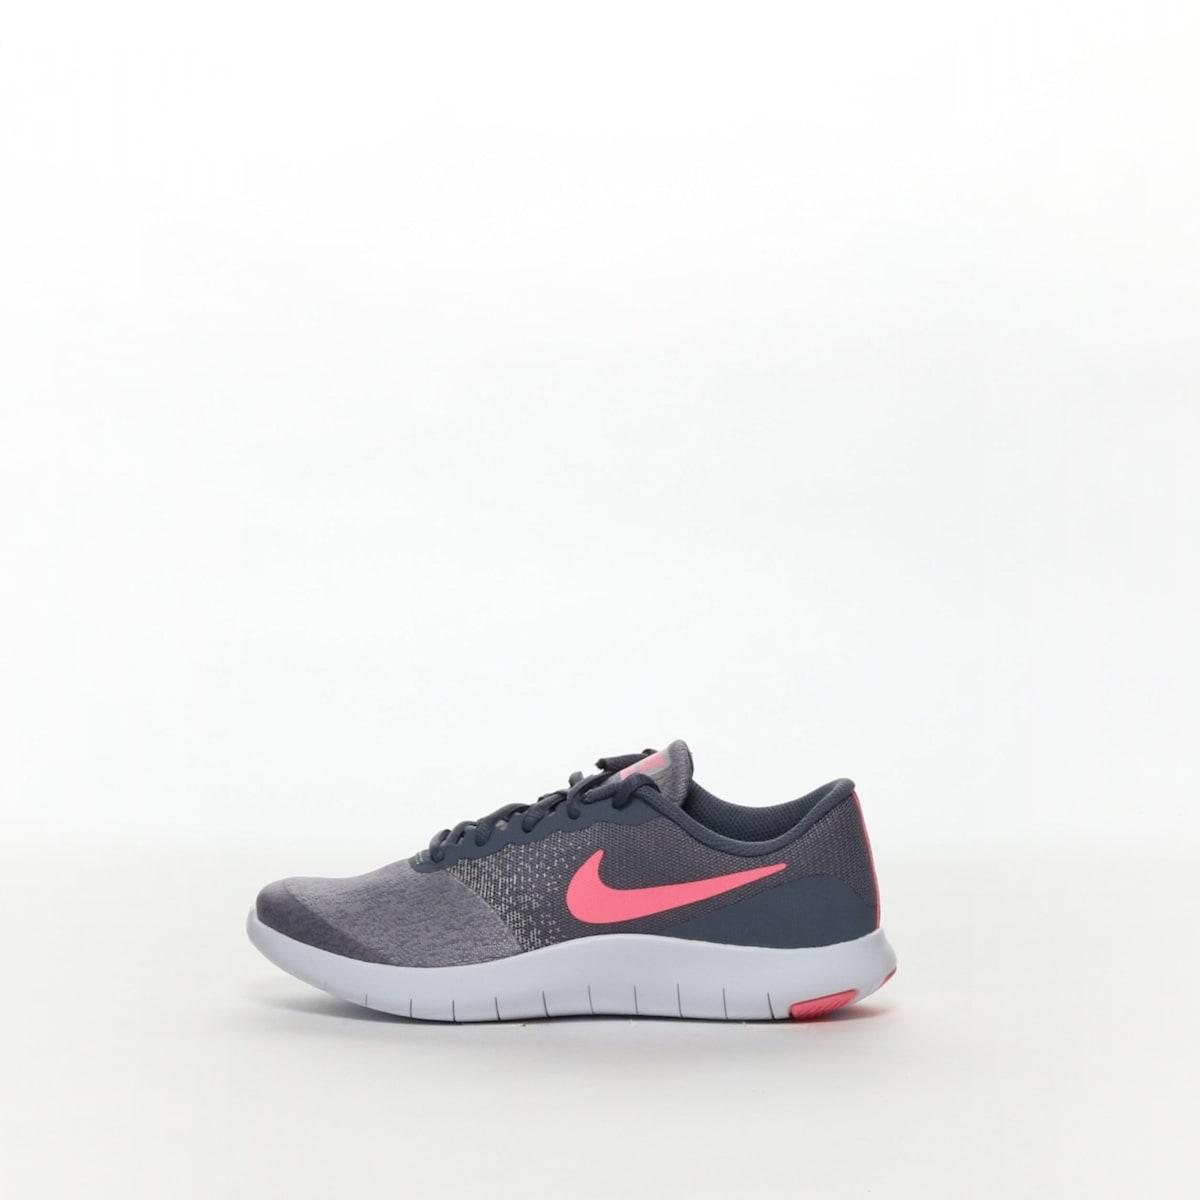 db1639e3c054d Girls  Nike Flex Contact (GS) Running Shoe - LGTCAR SNSPLS – Resku